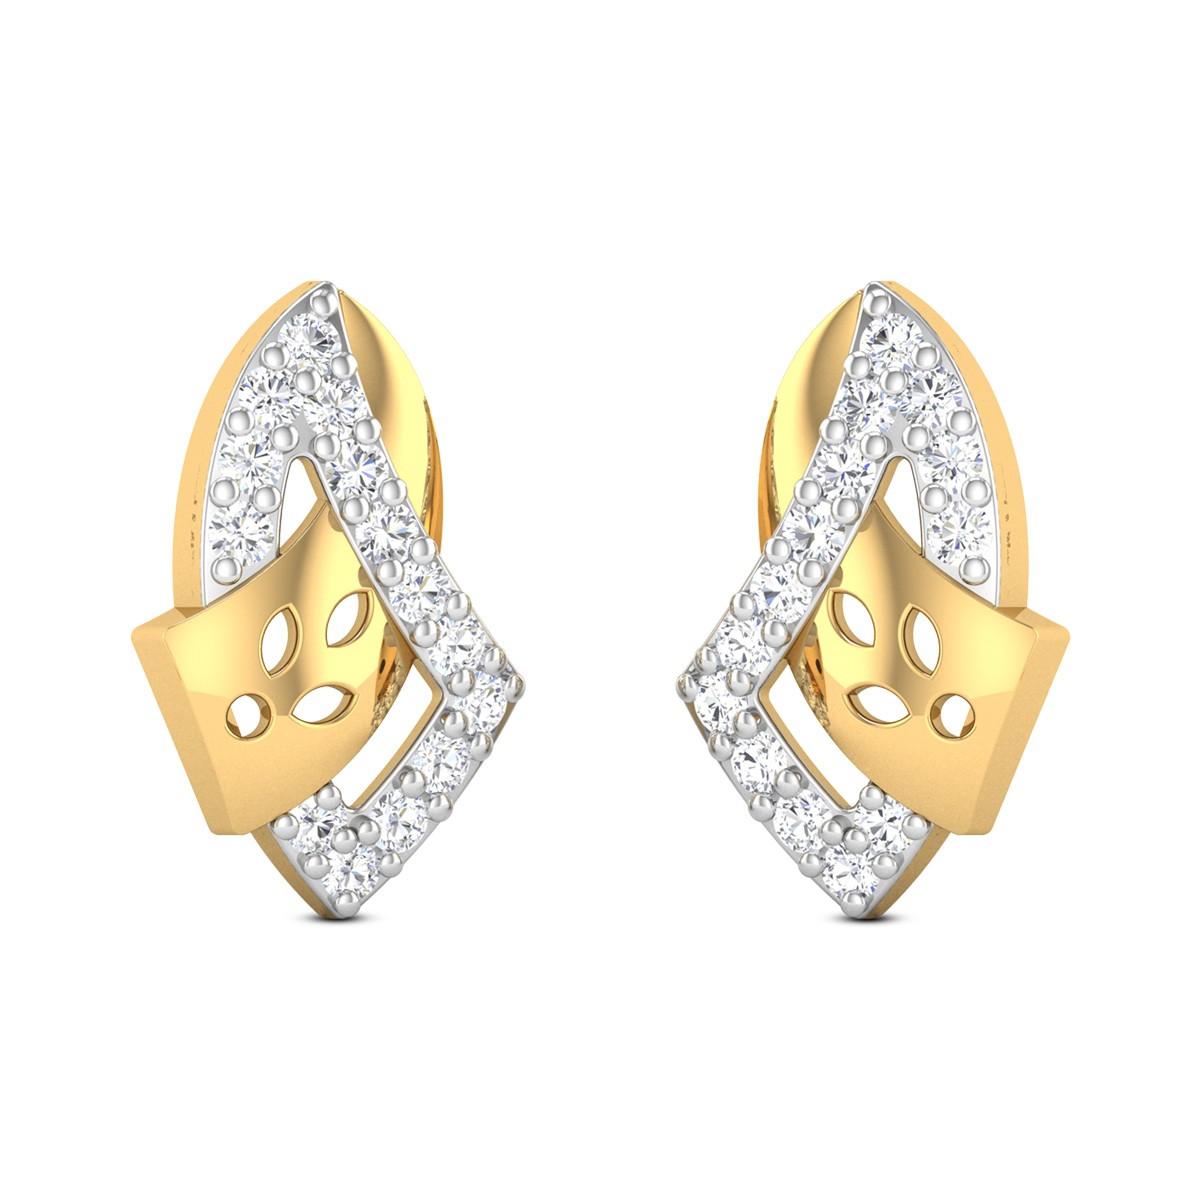 Libitina Diamond Earrings